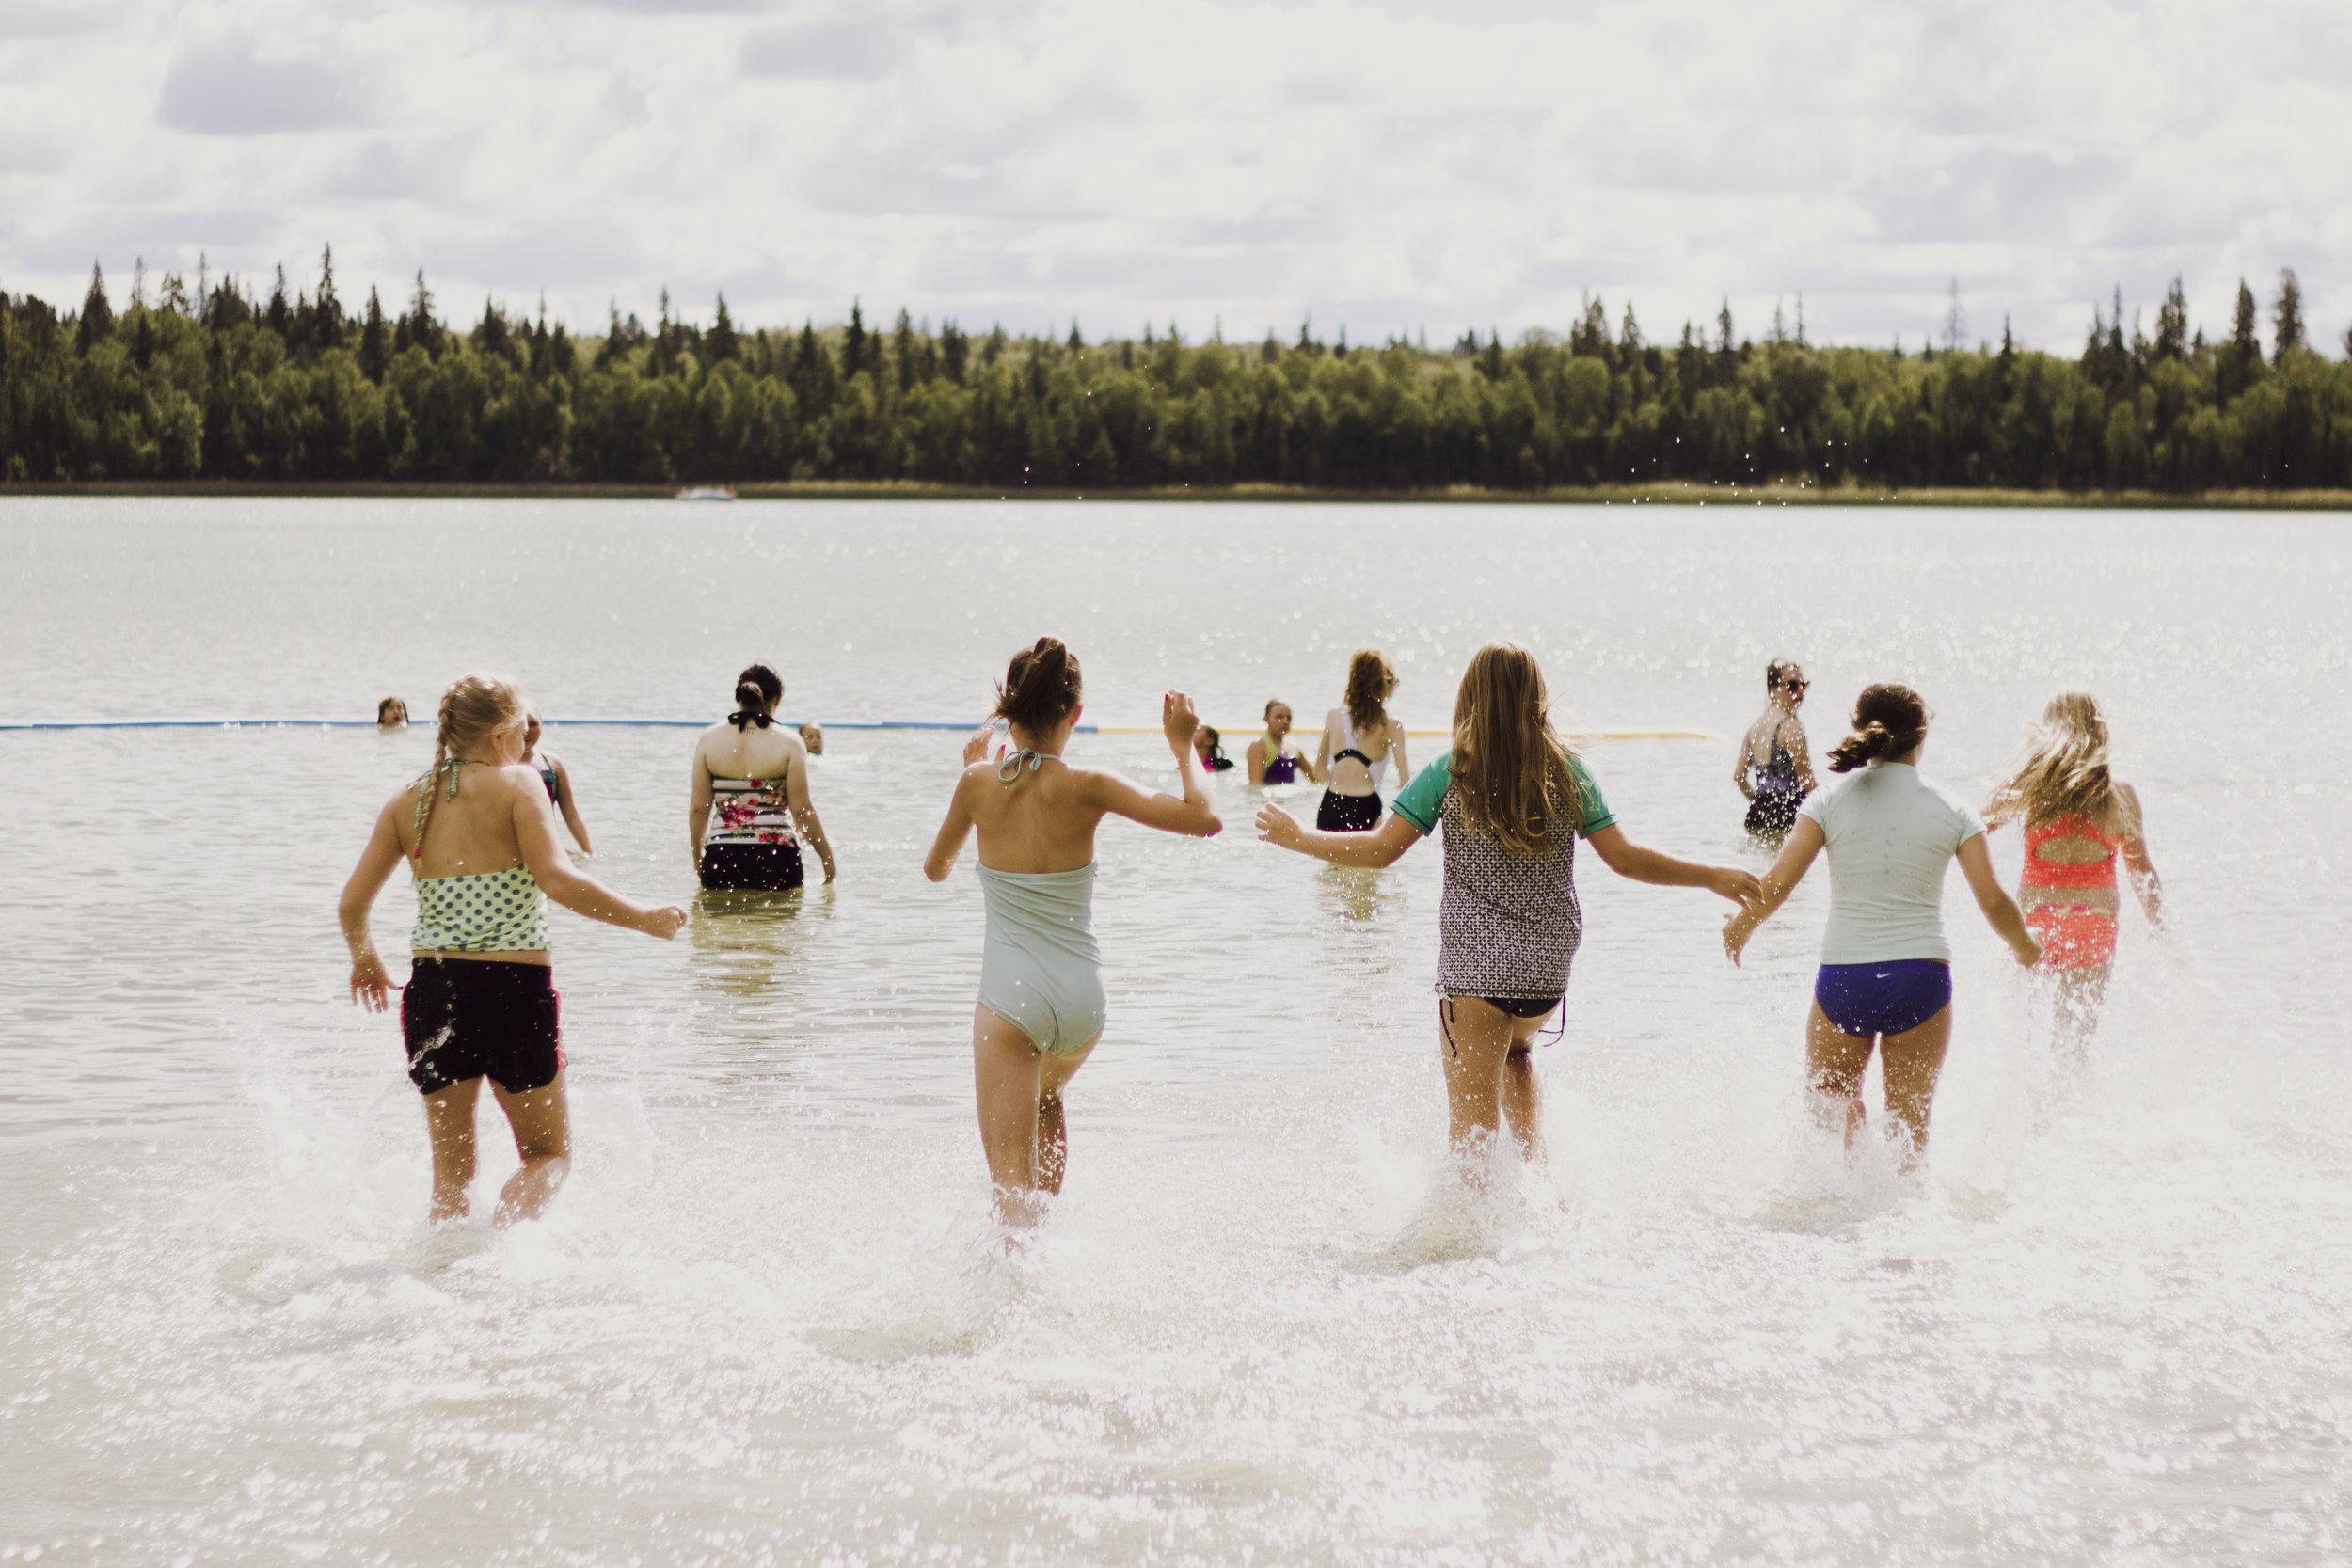 Swimming in Christopher Lake